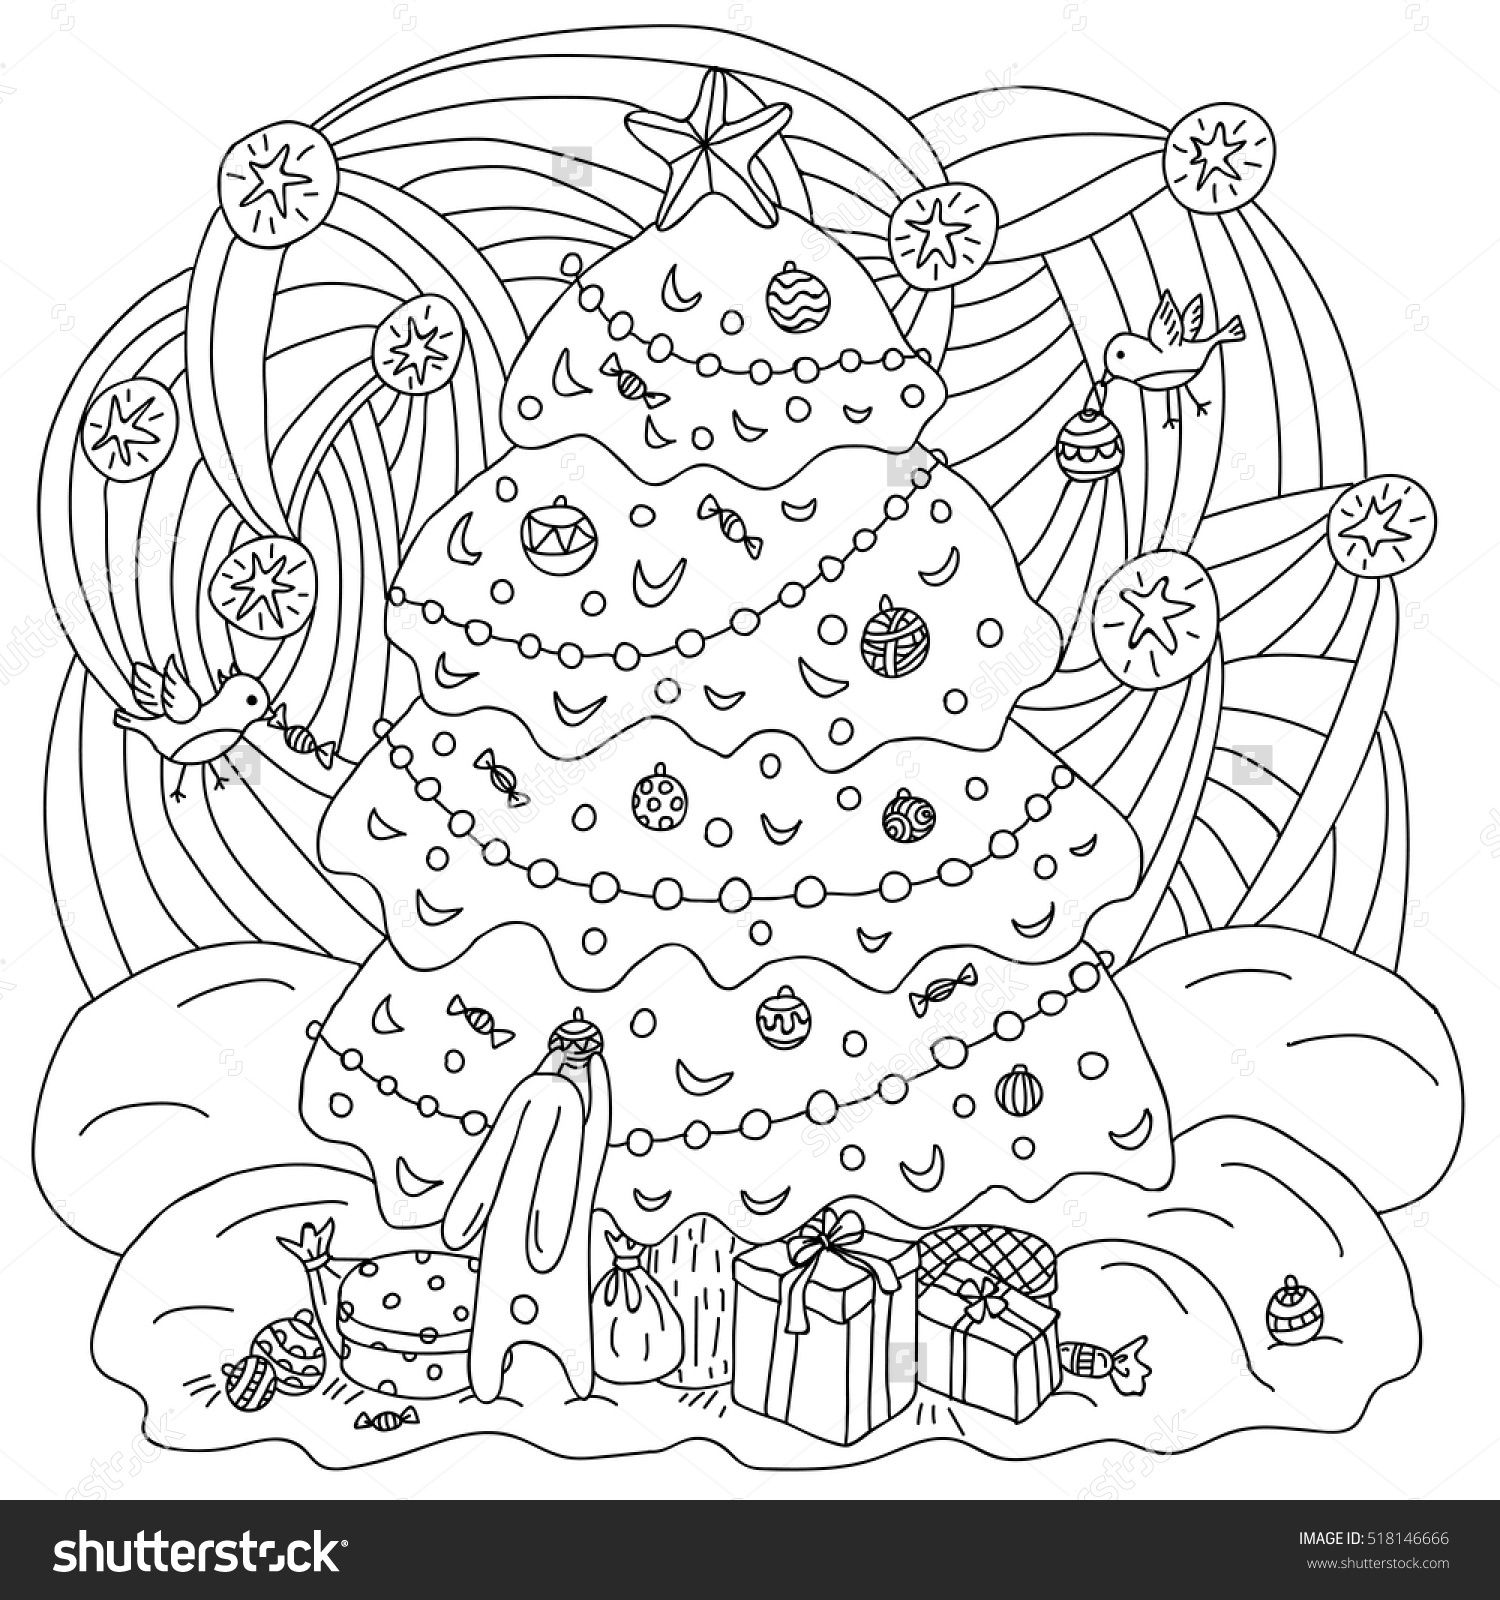 Coloring book xmas theme gift card hare and birds adorn the